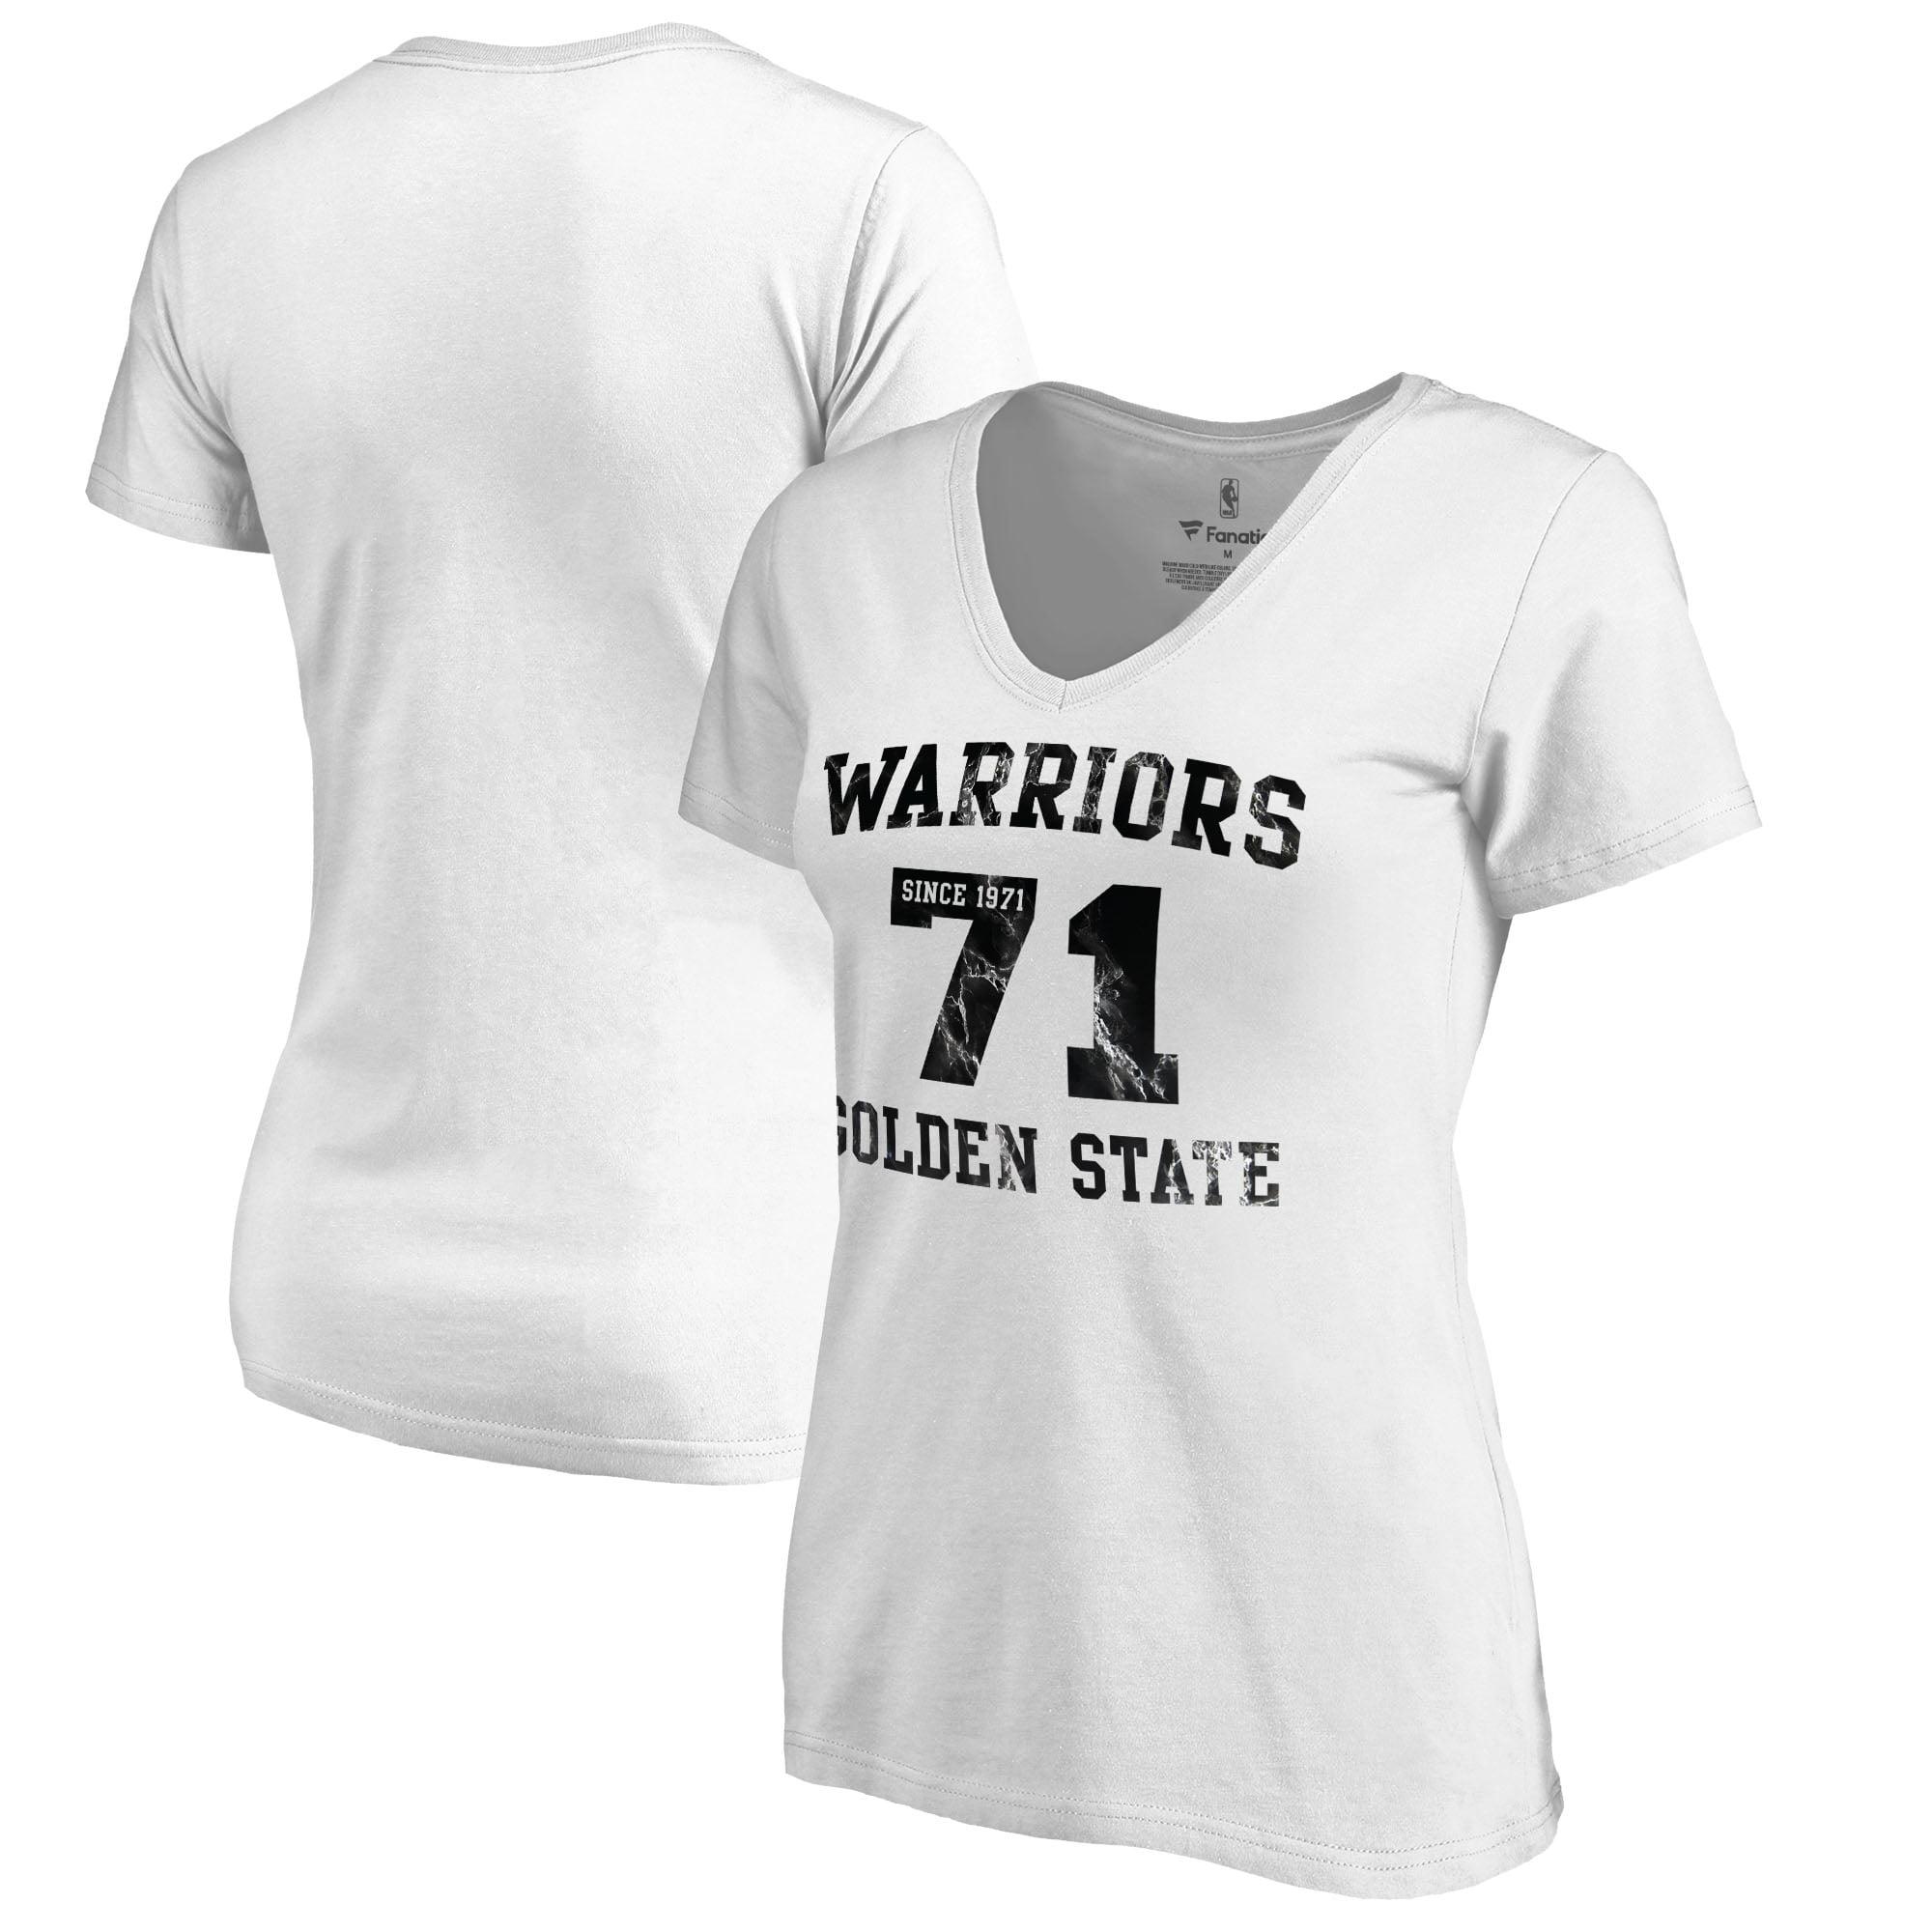 Golden State Warriors Fanatics Branded Women's Hang Time Plus Size V-Neck T-Shirt - White